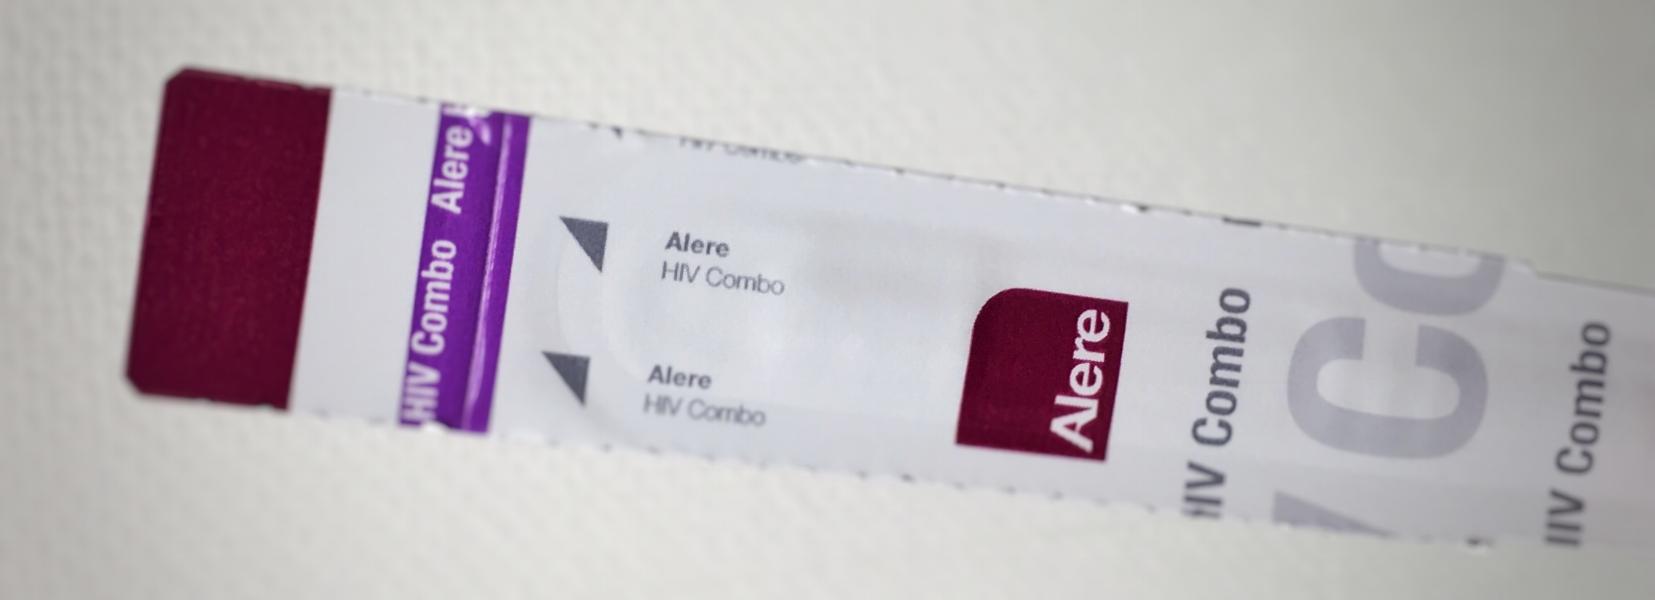 Dynascreen HIV Combo